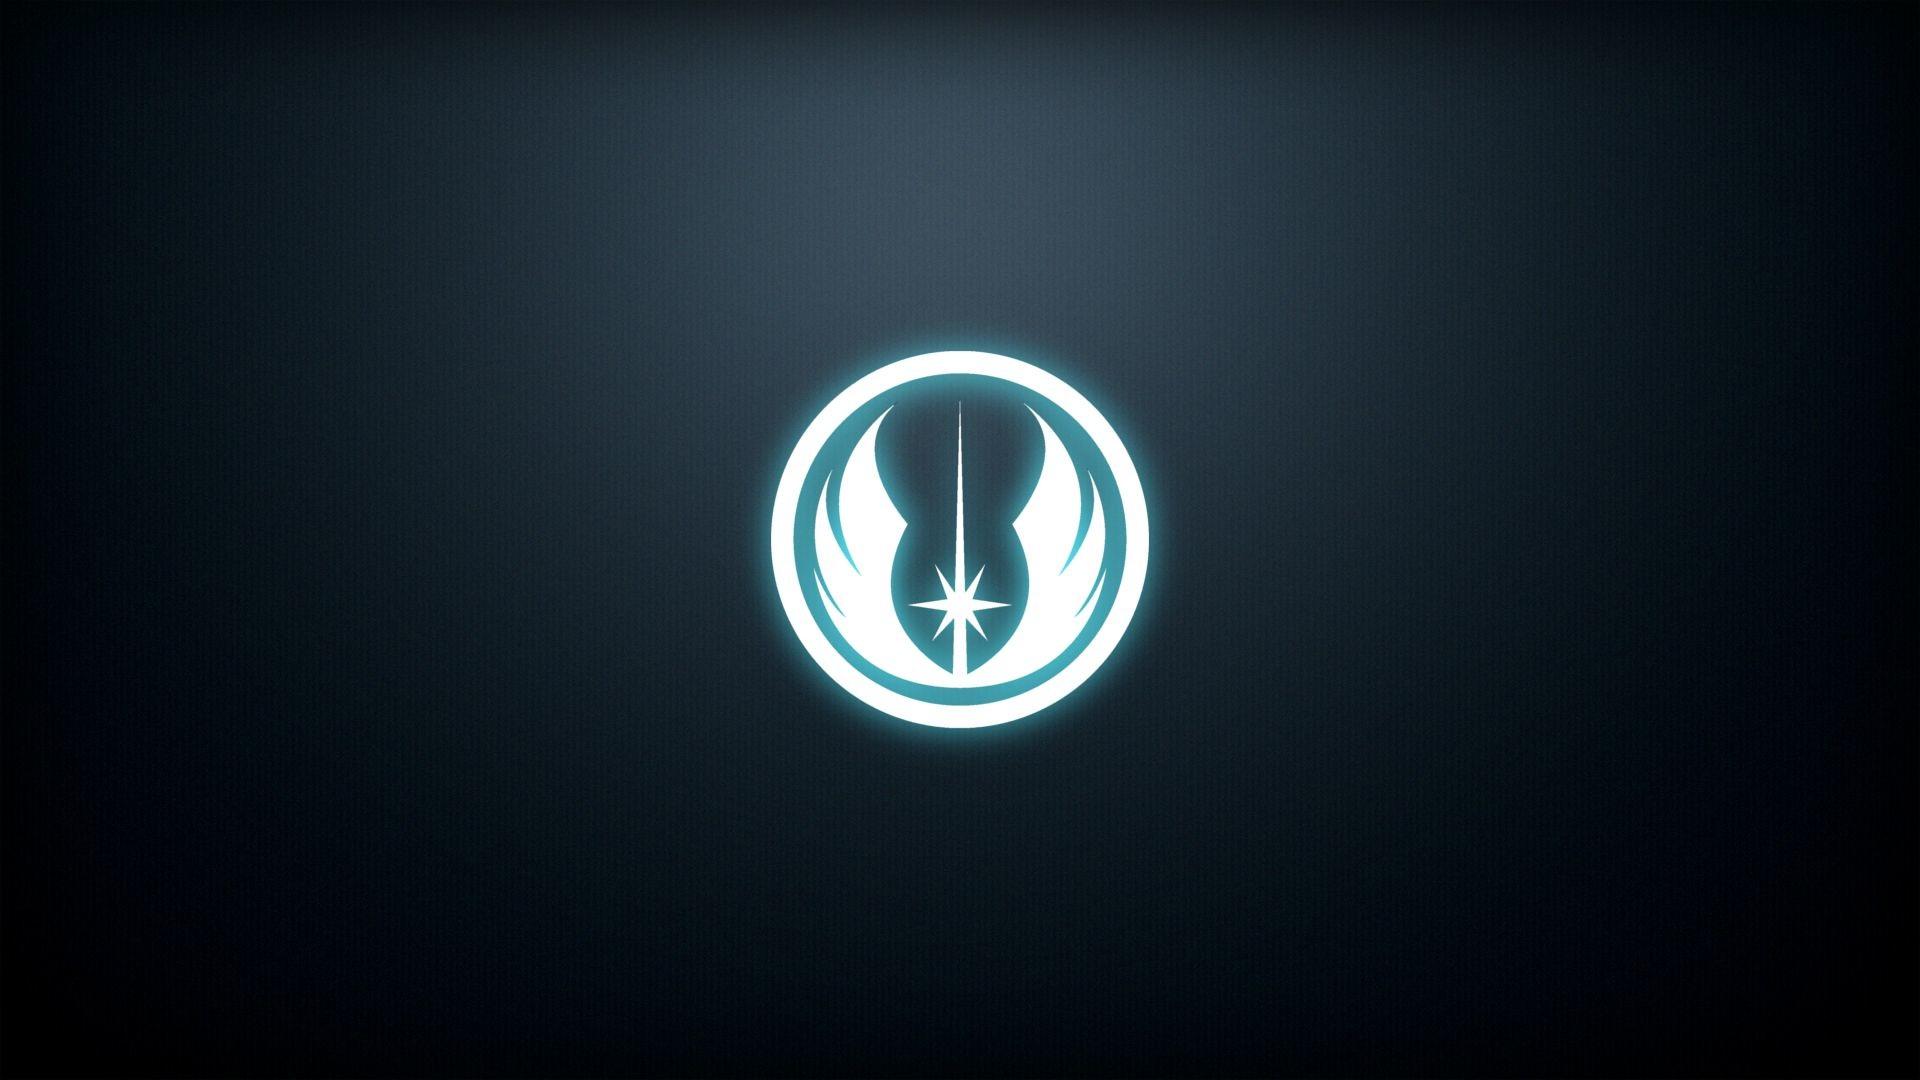 Jedi Symbol Wallpaper 72 Images